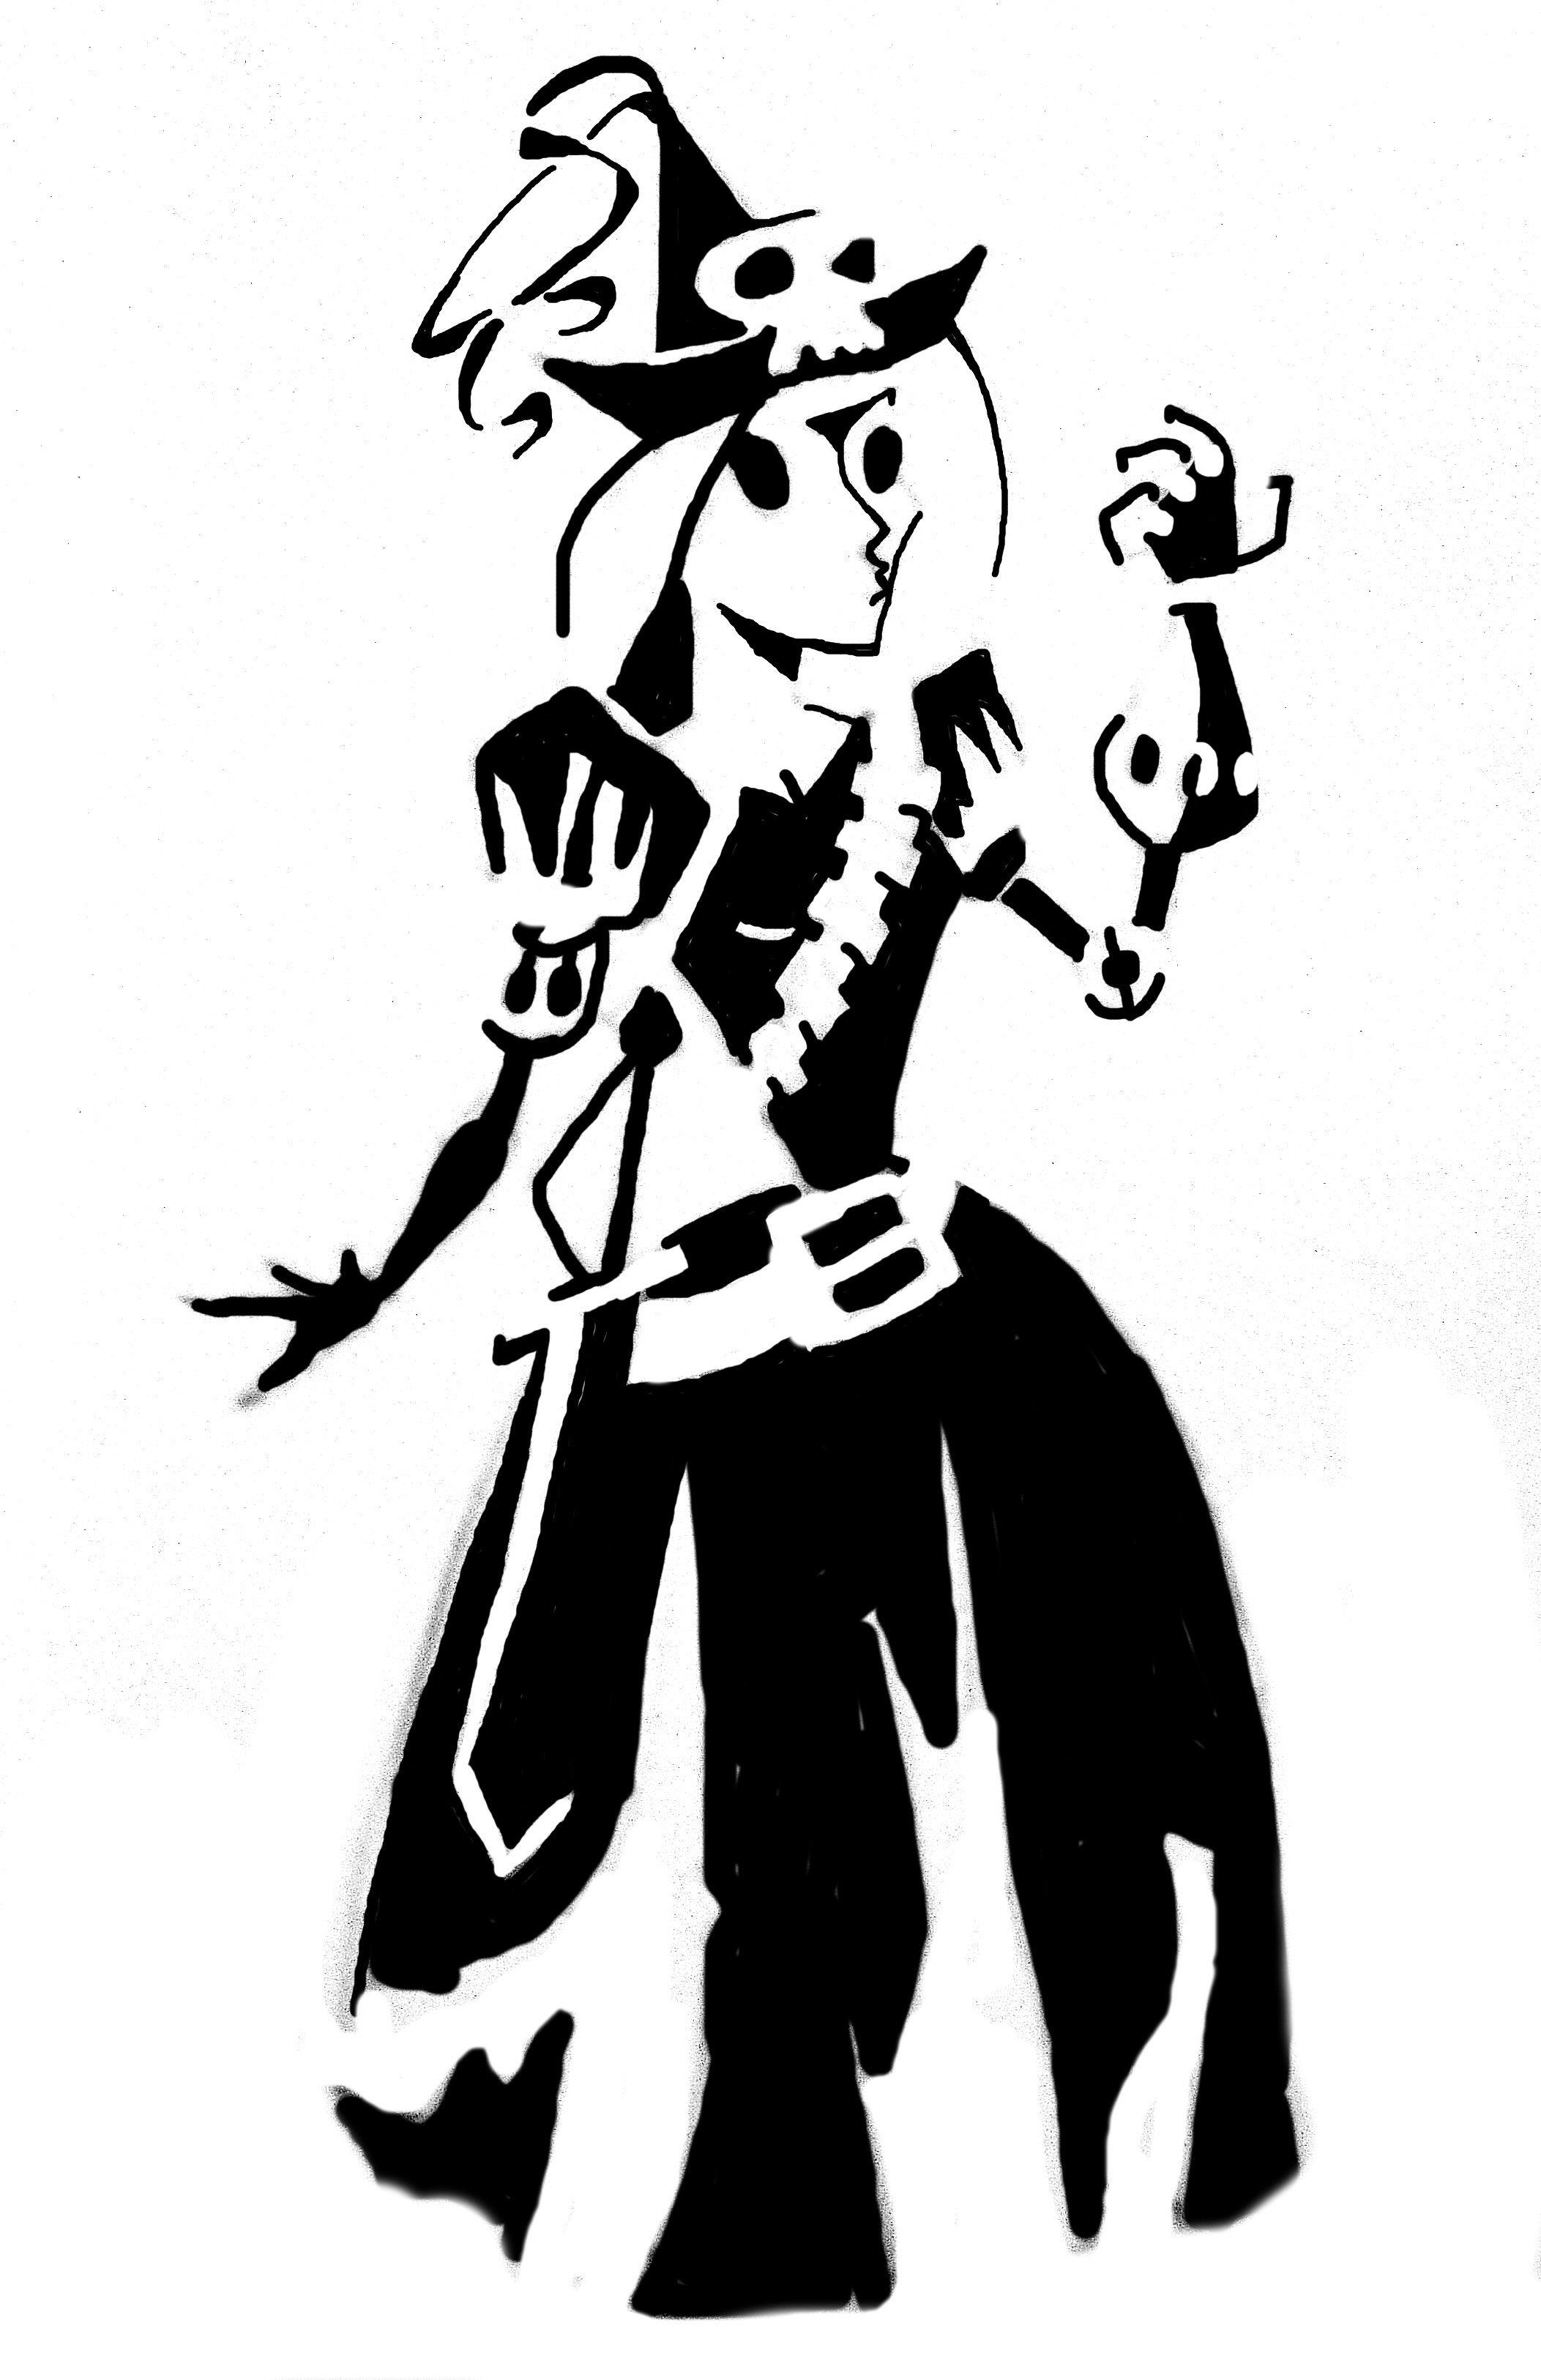 Free Pirate Ship Stencil Download Free Clip Art Free